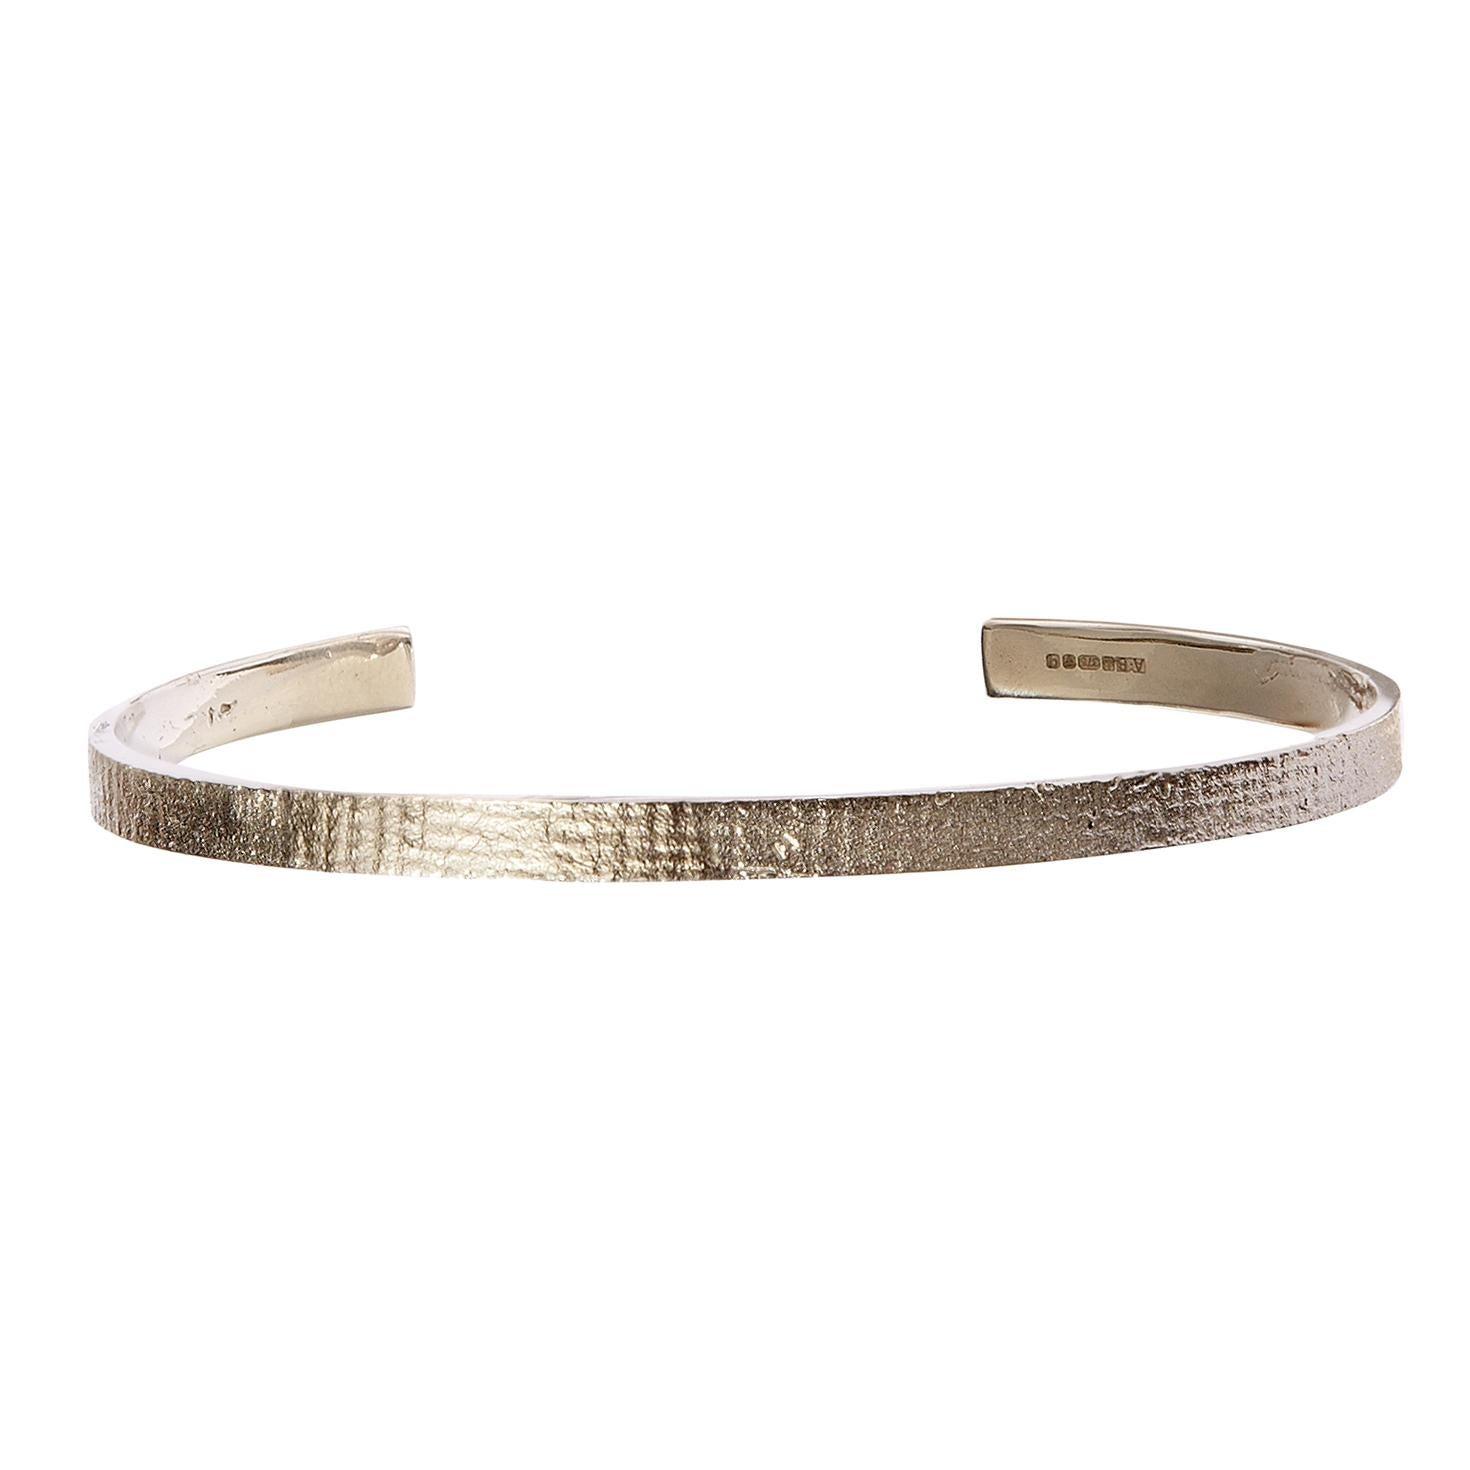 Men's White Gold Paper Cuff Bracelet by Allison Bryan